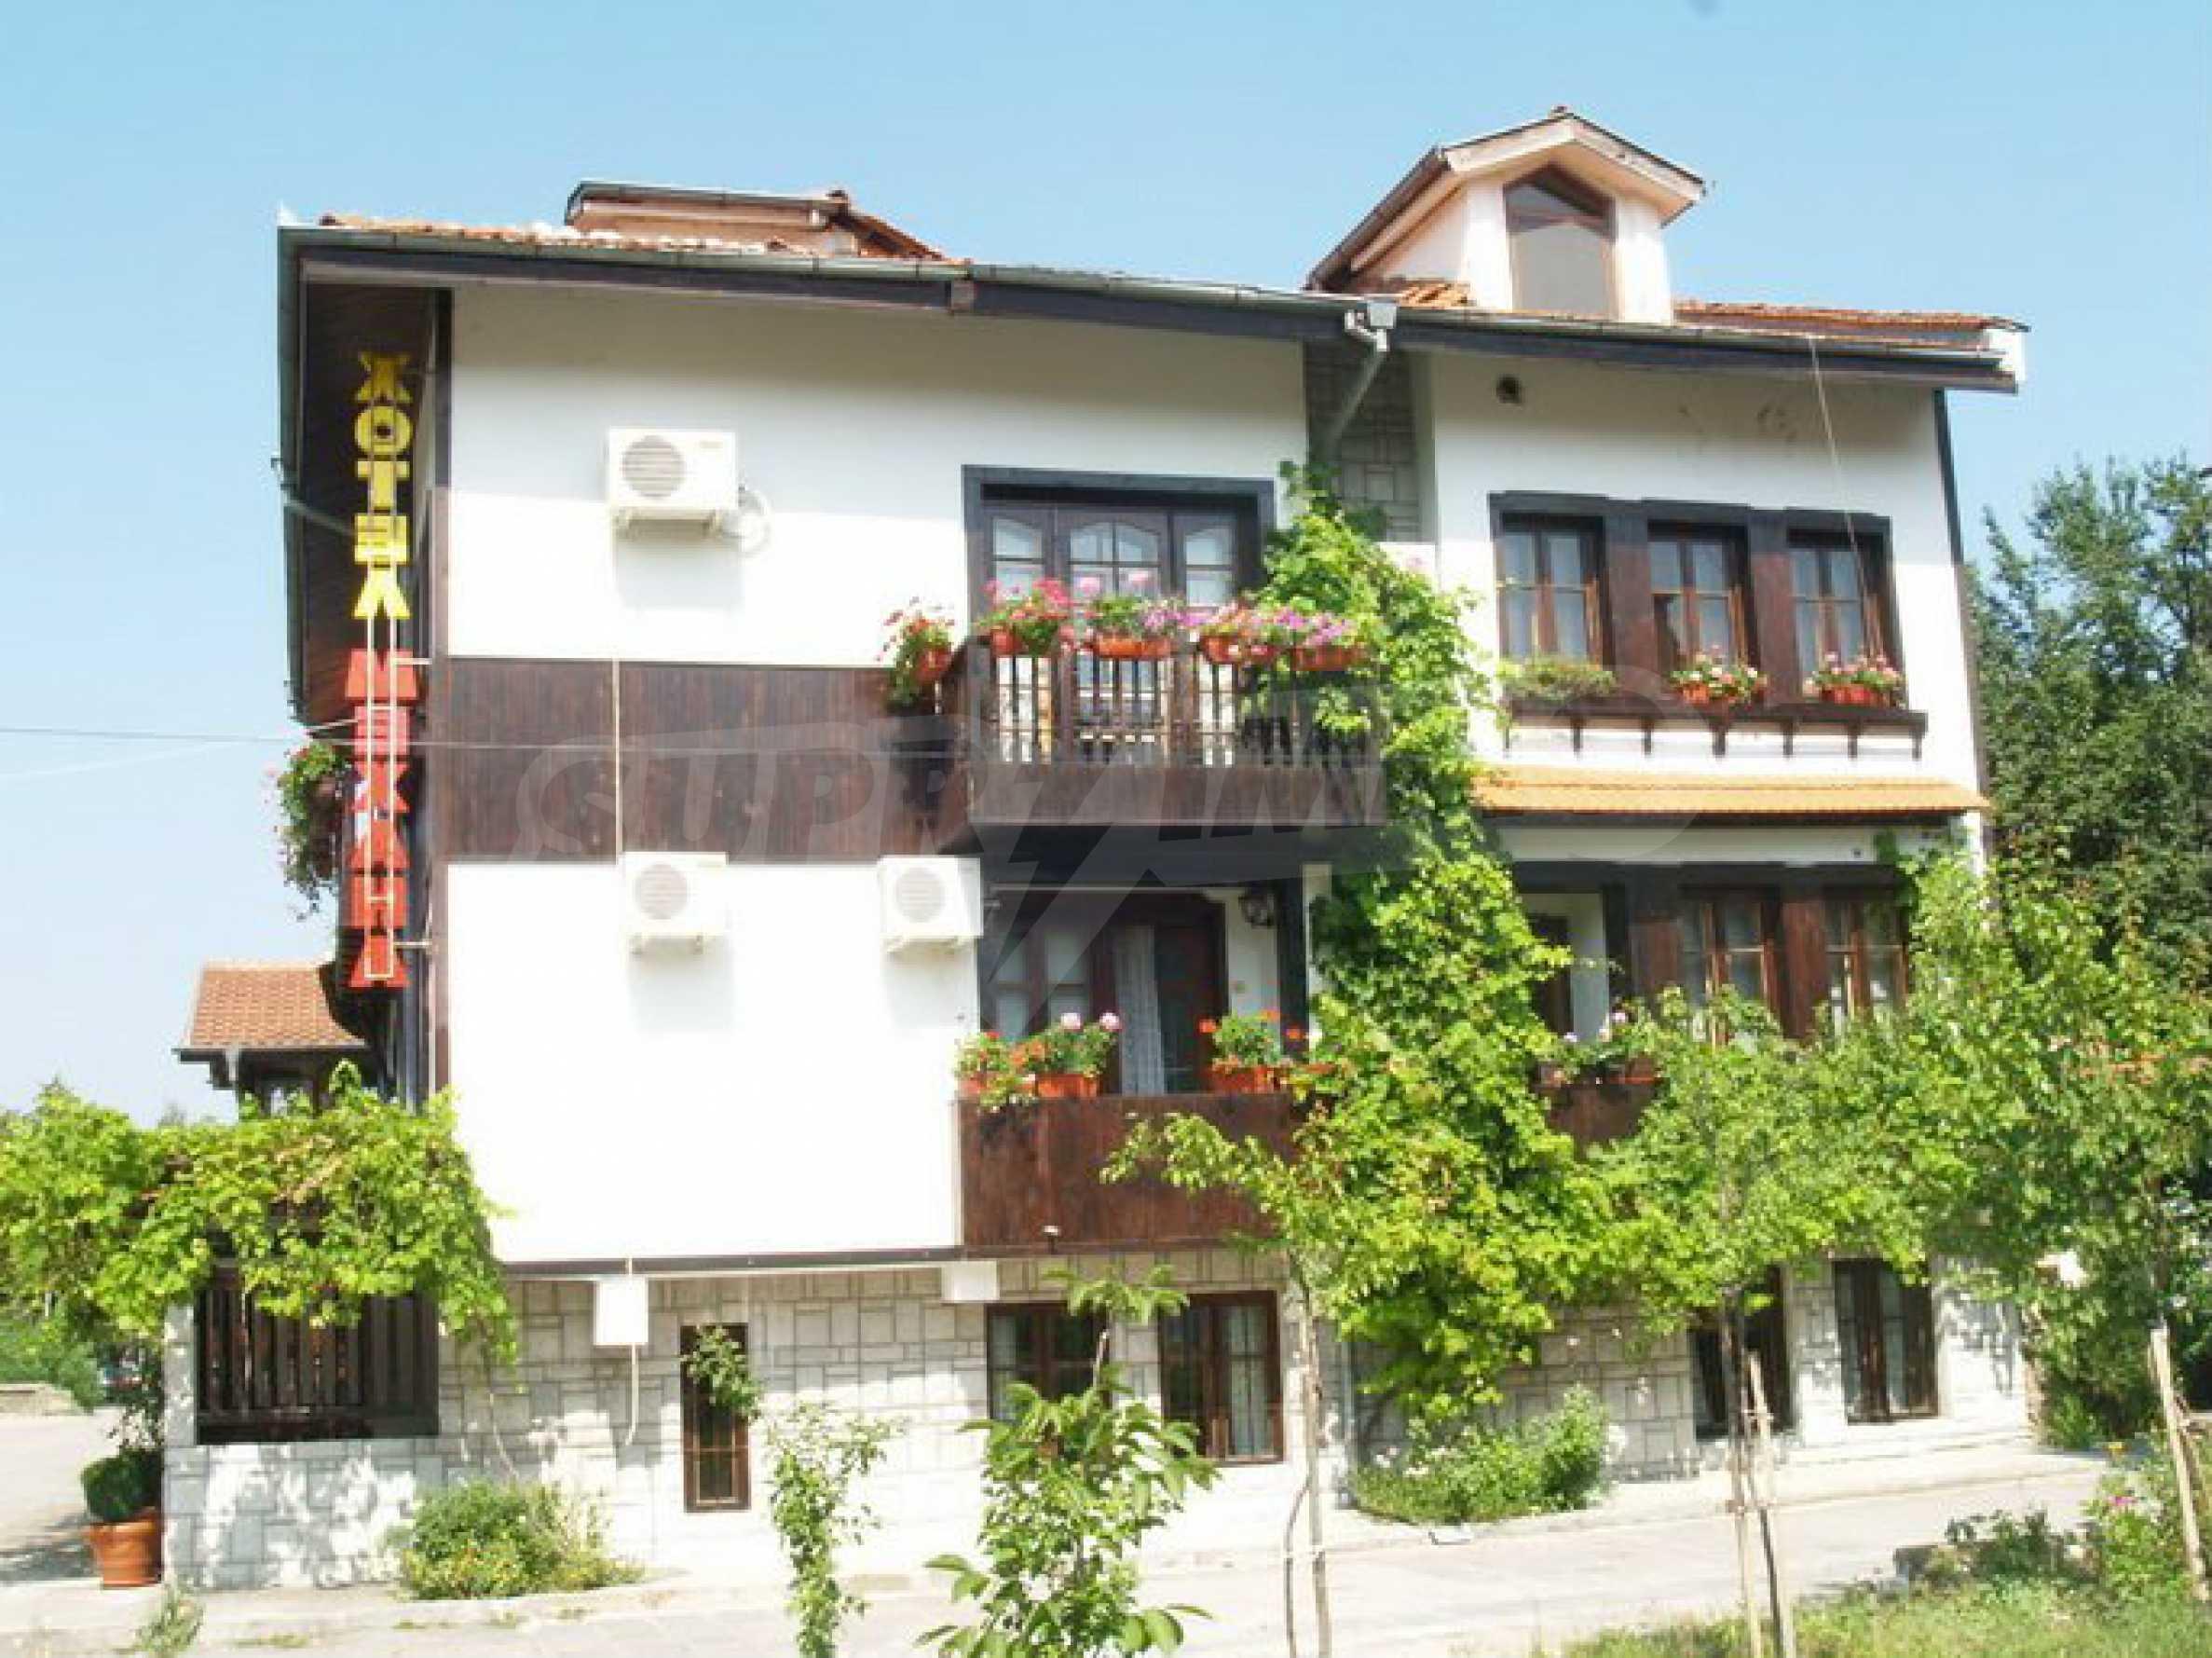 Hotelanlage mit Restaurant am Ufer des Flusses Osam in Lovech 6